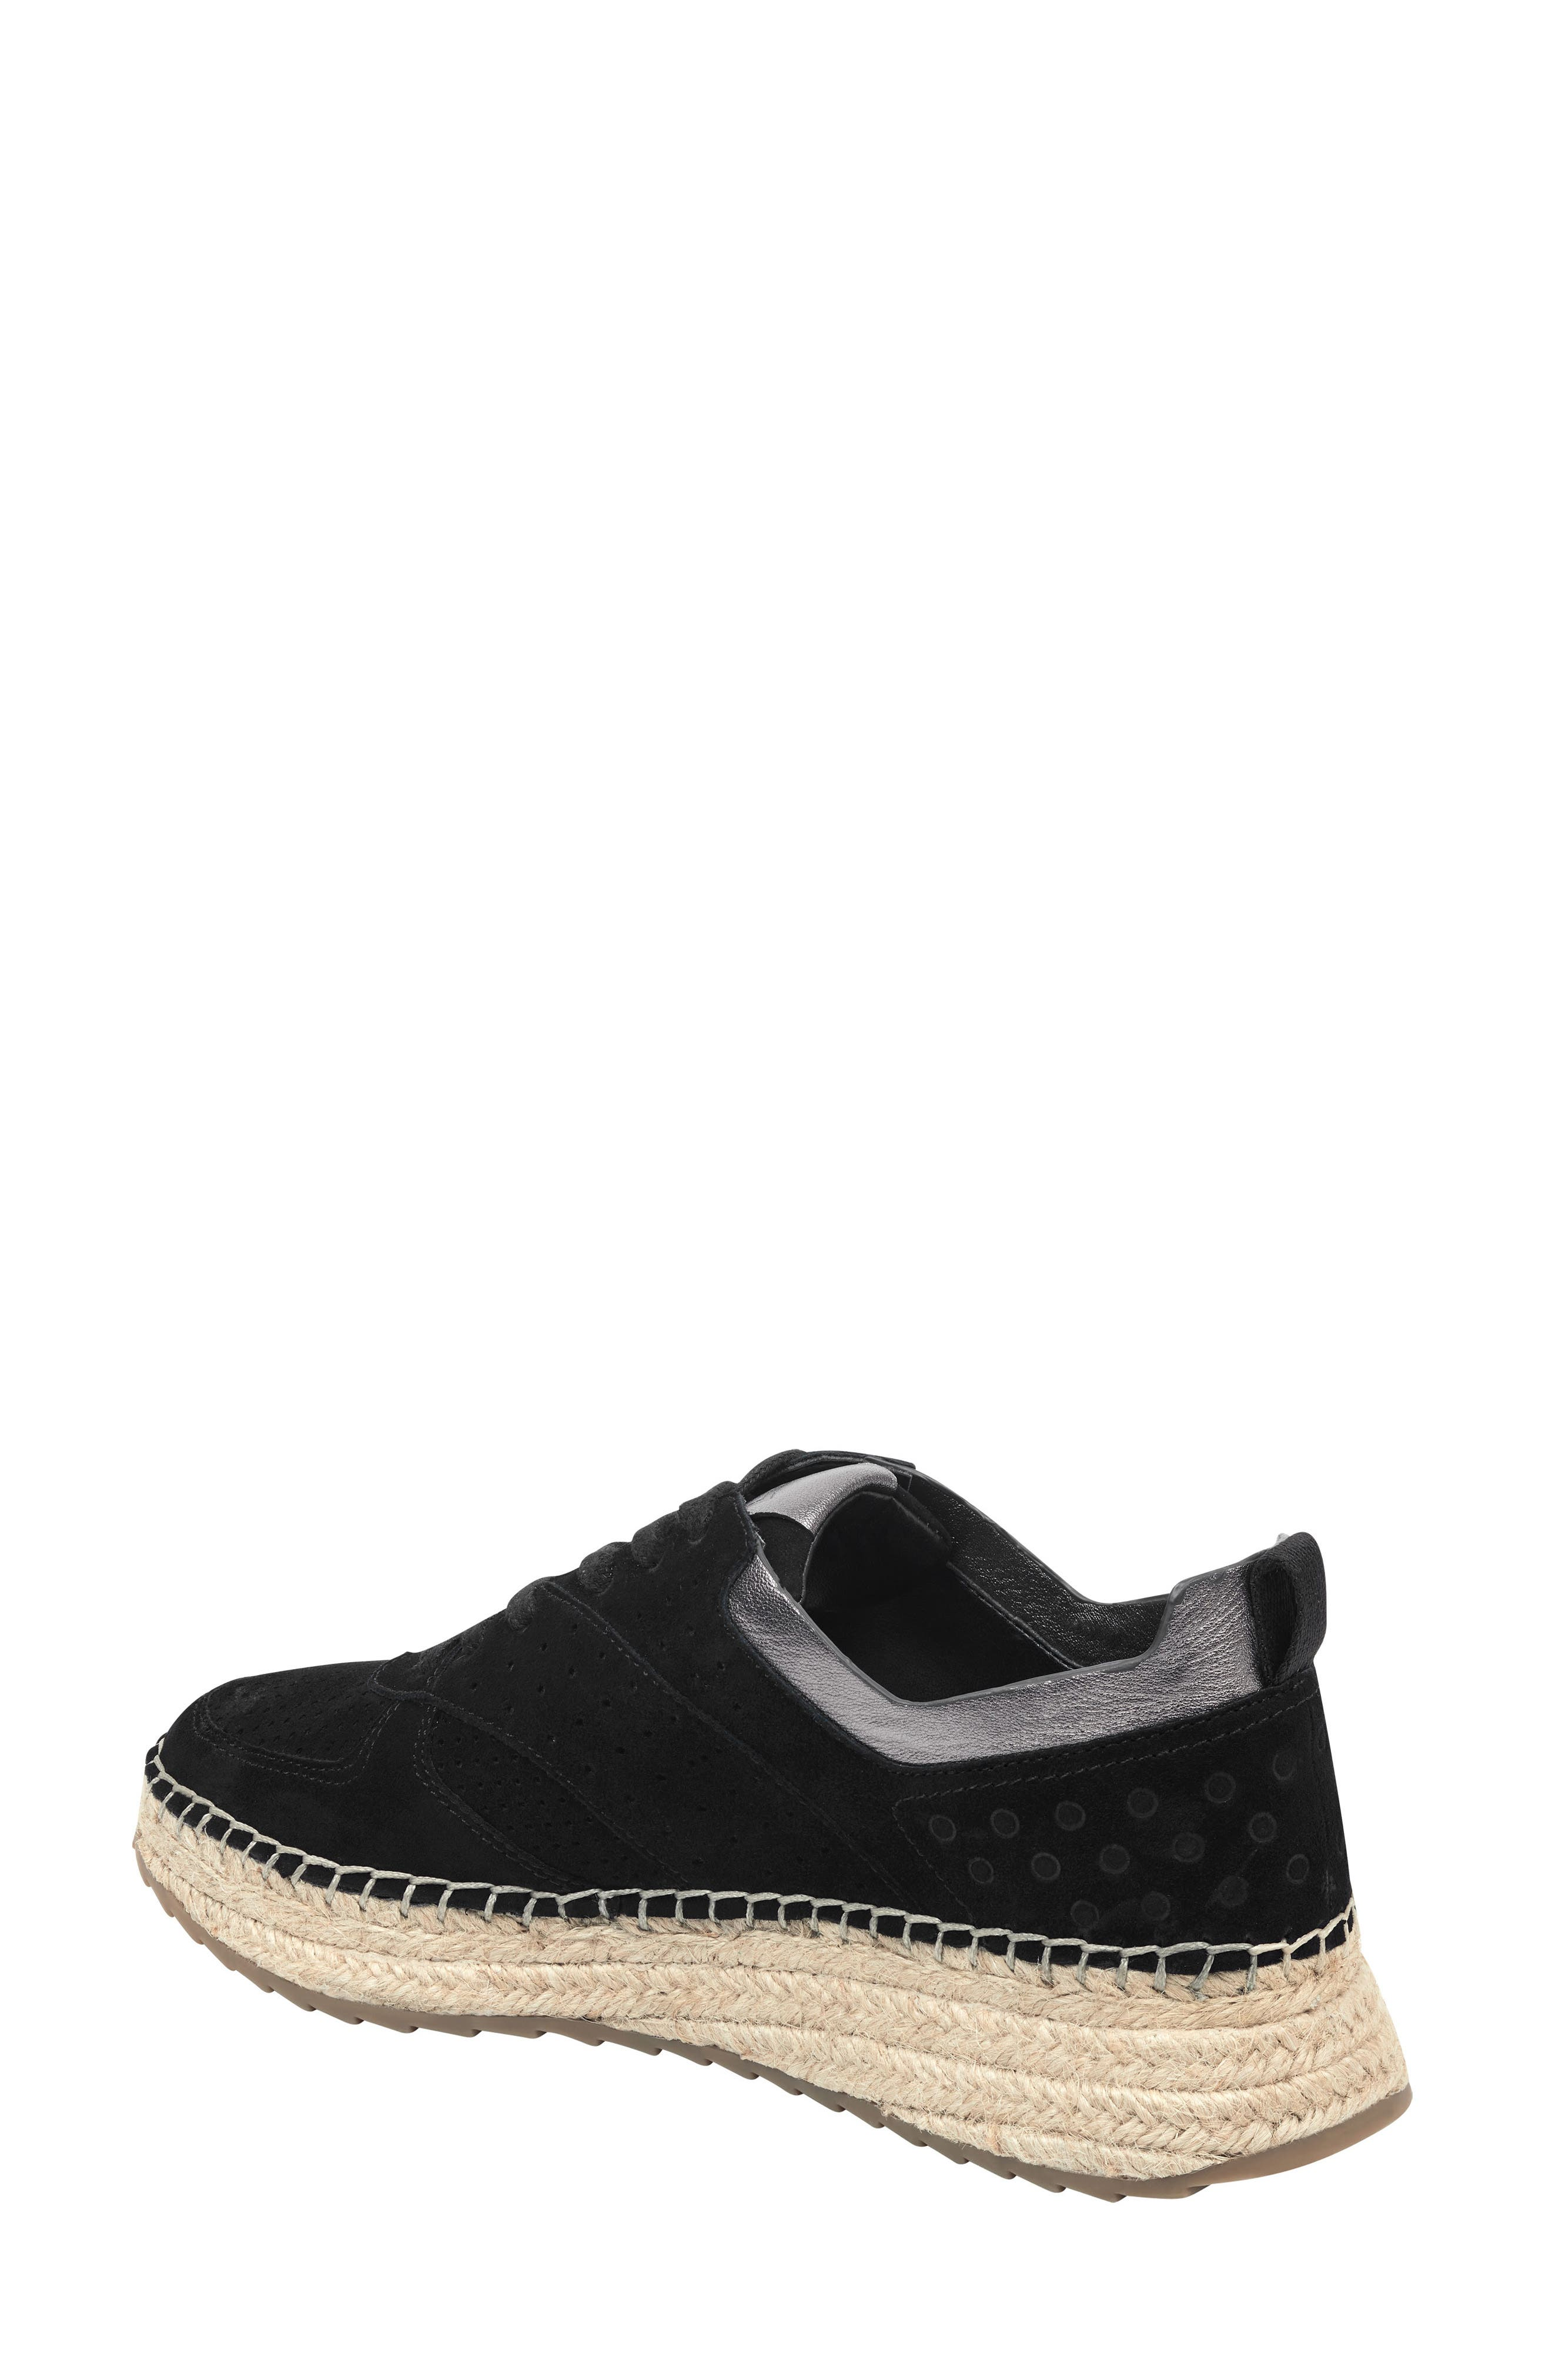 MARC FISHER LTD, Julio Sneaker, Alternate thumbnail 2, color, BLACK SUEDE